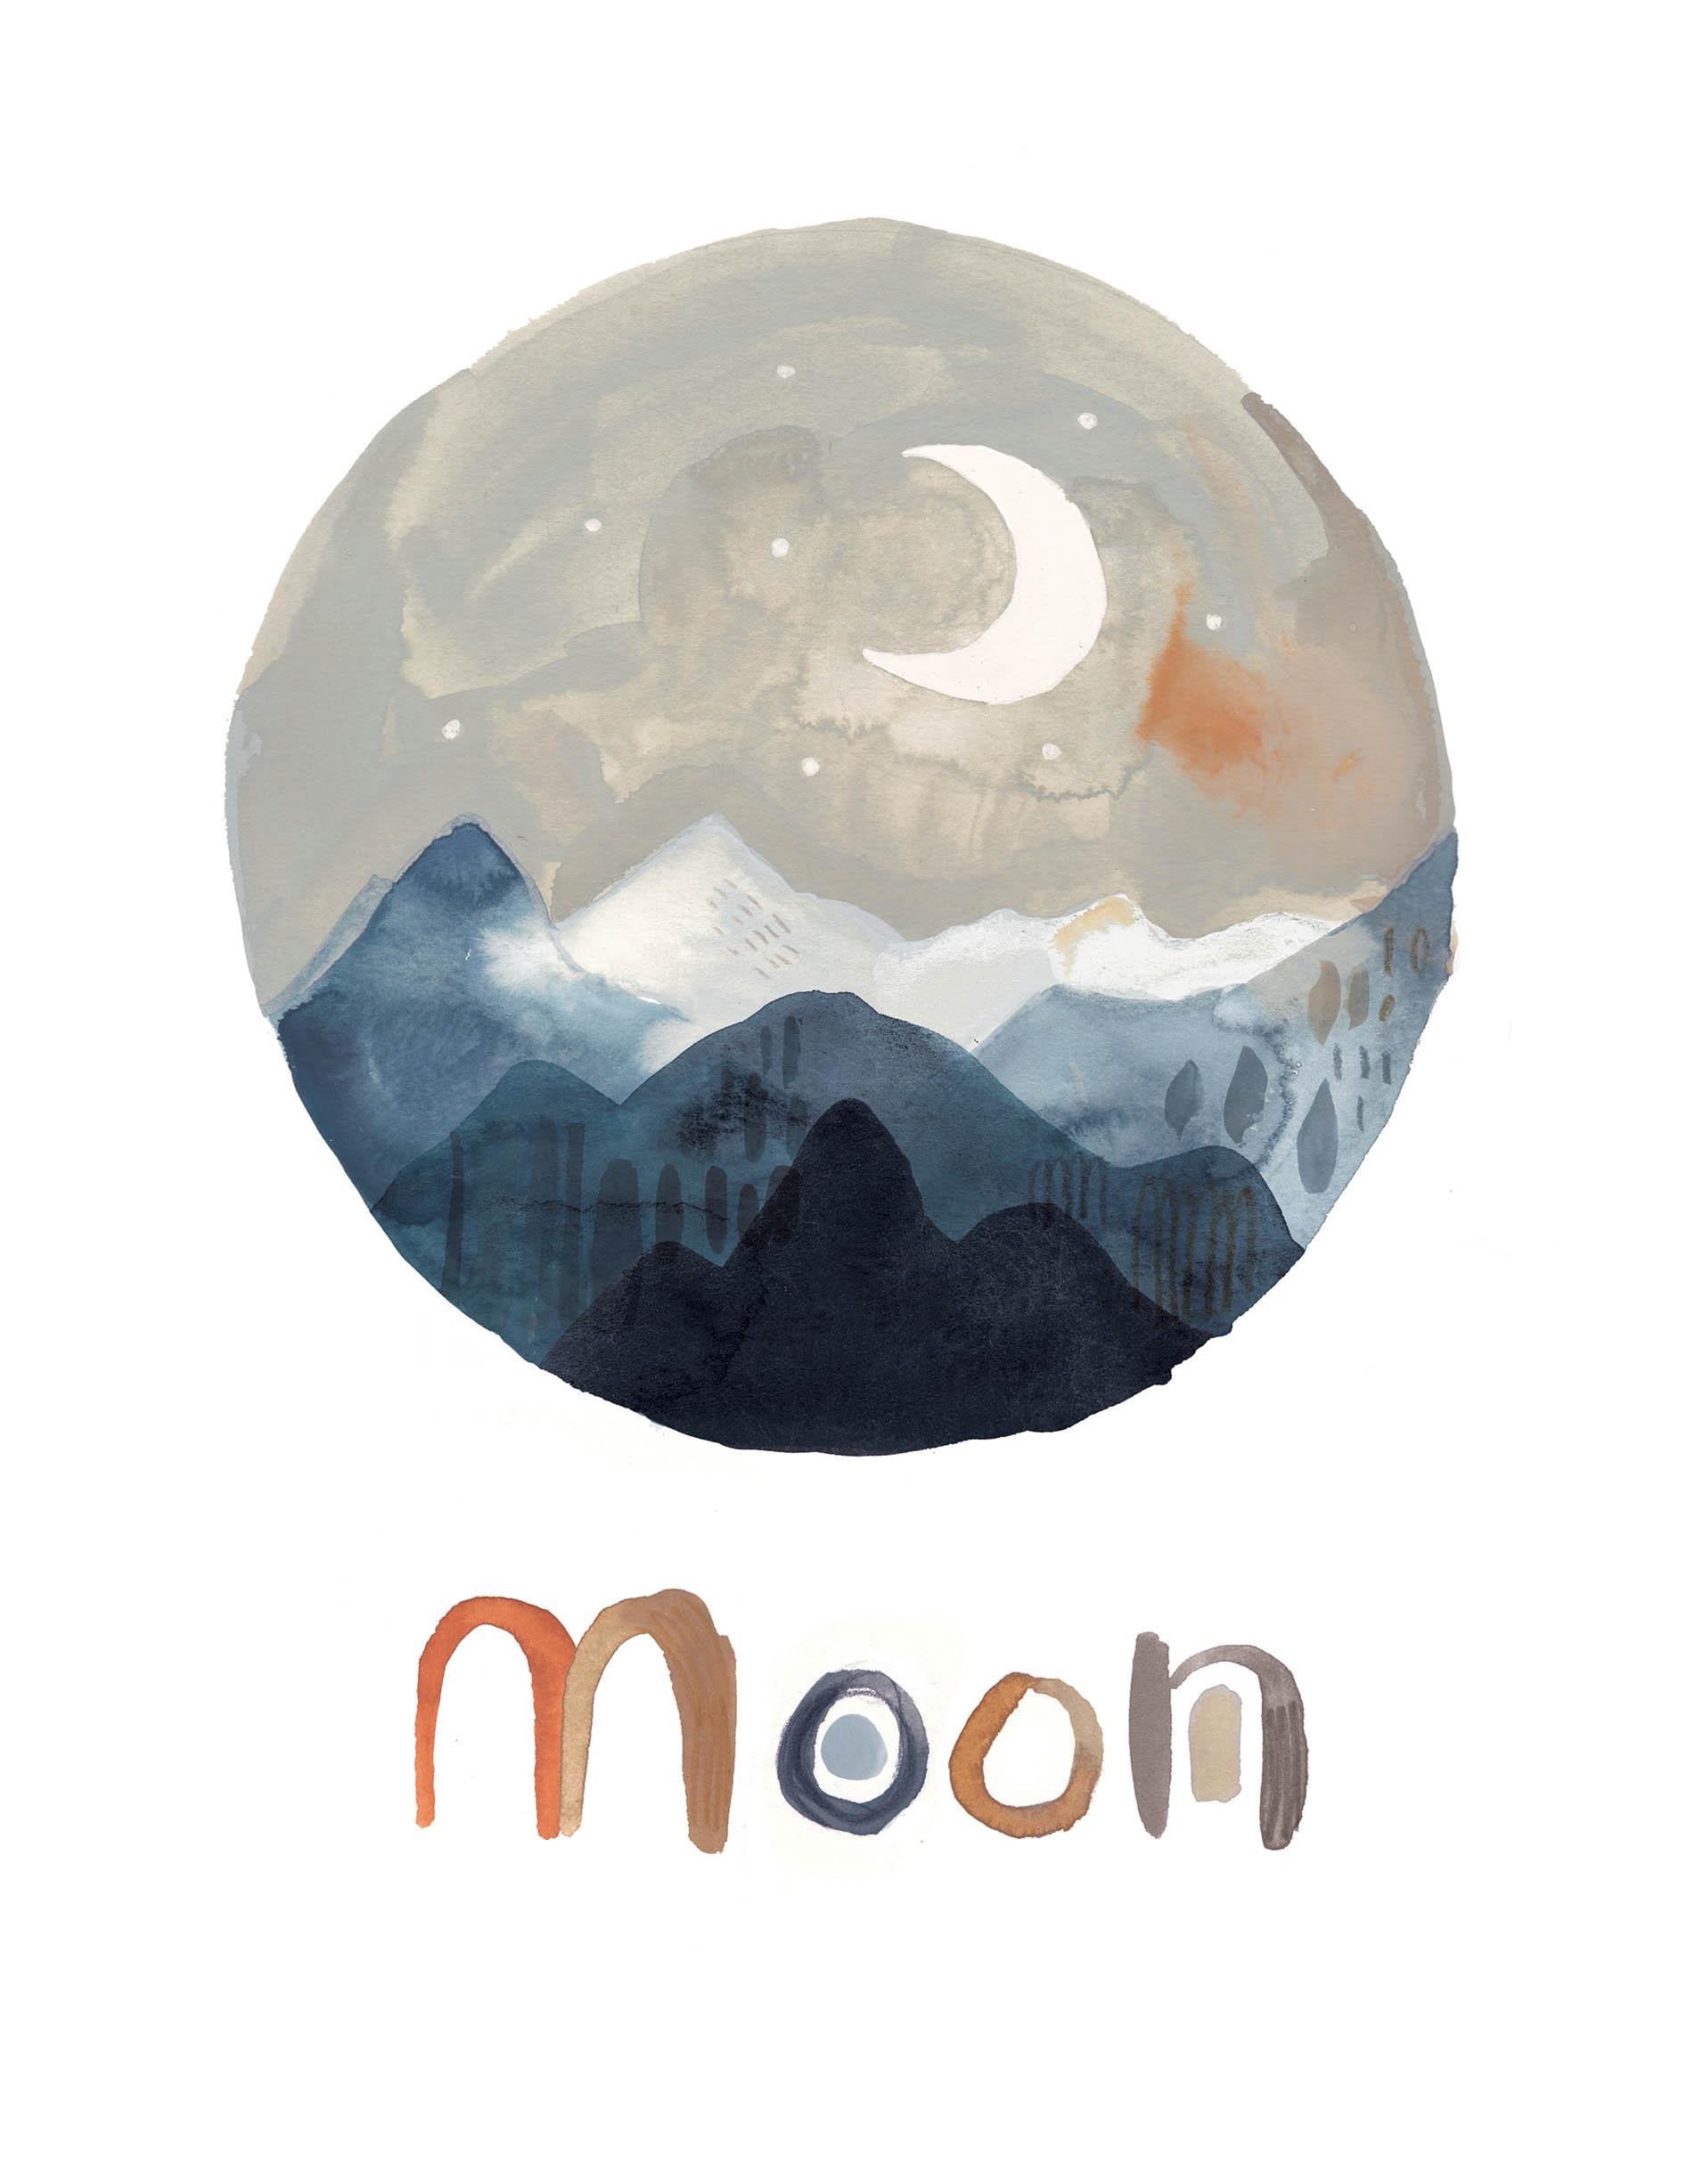 Moon LR.jpg